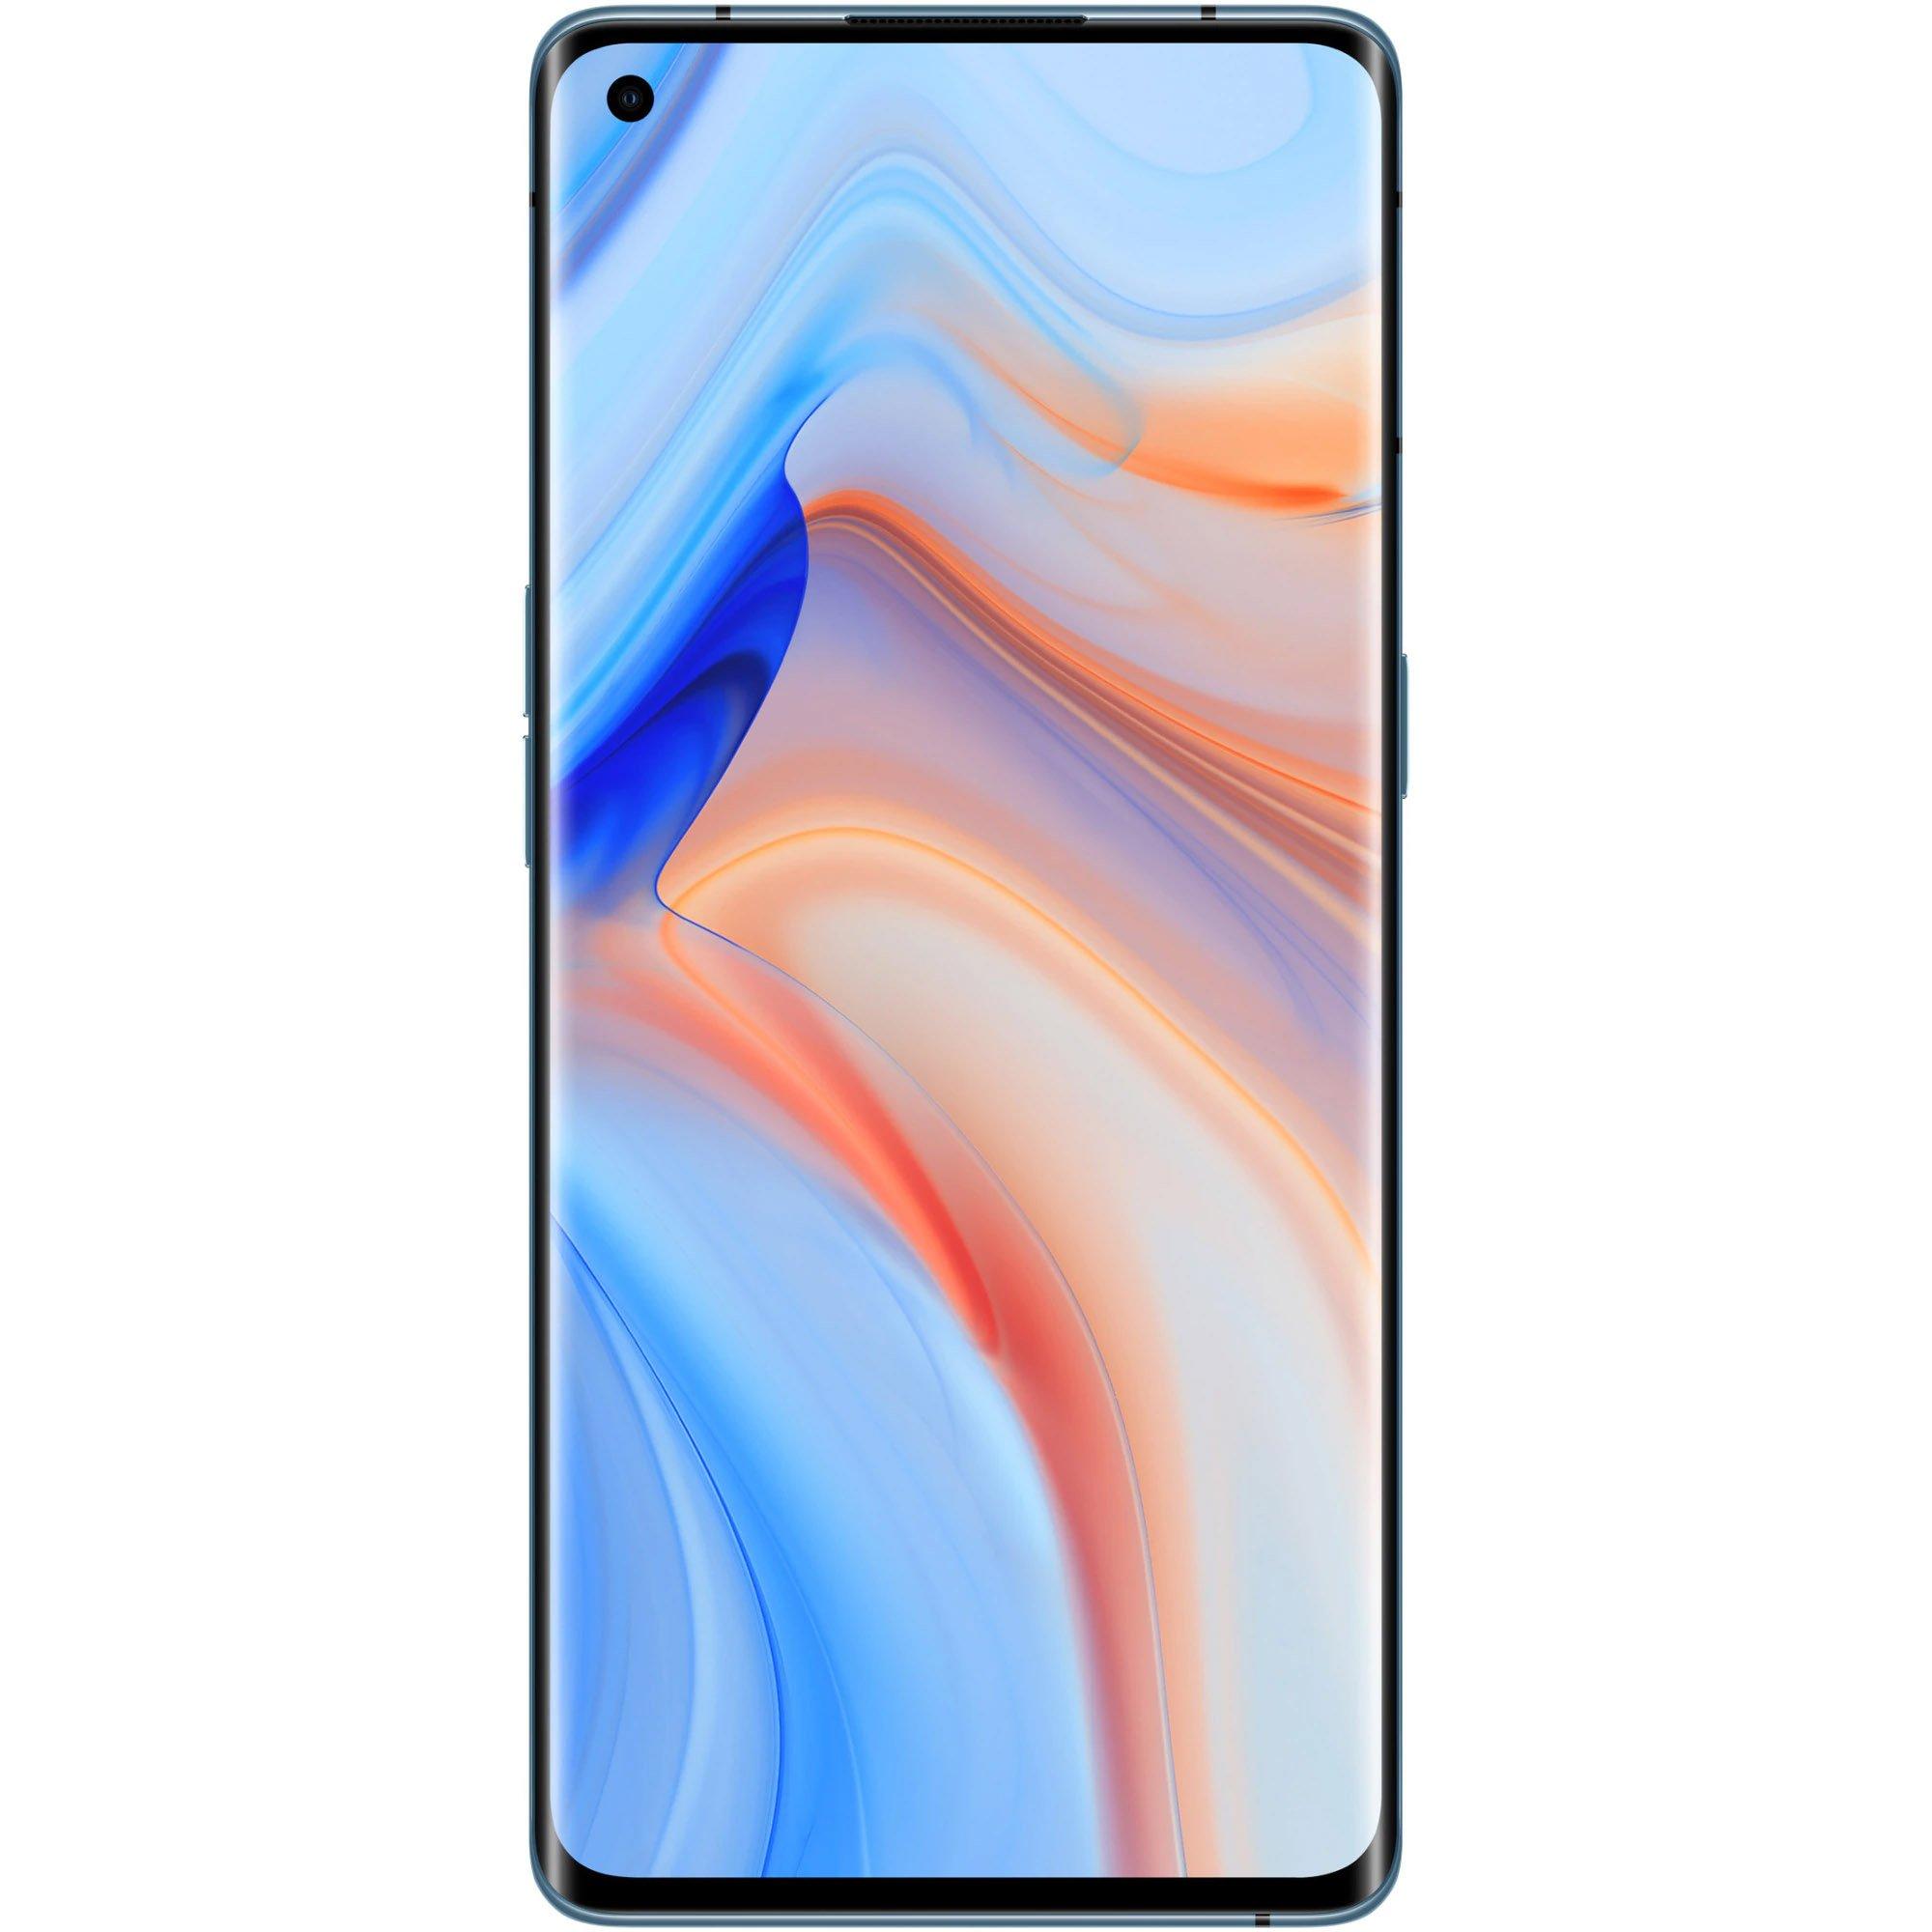 Telefon mobil Oppo Reno4 Pro, 256GB, 12GB RAM, 5G, Galactic Blue